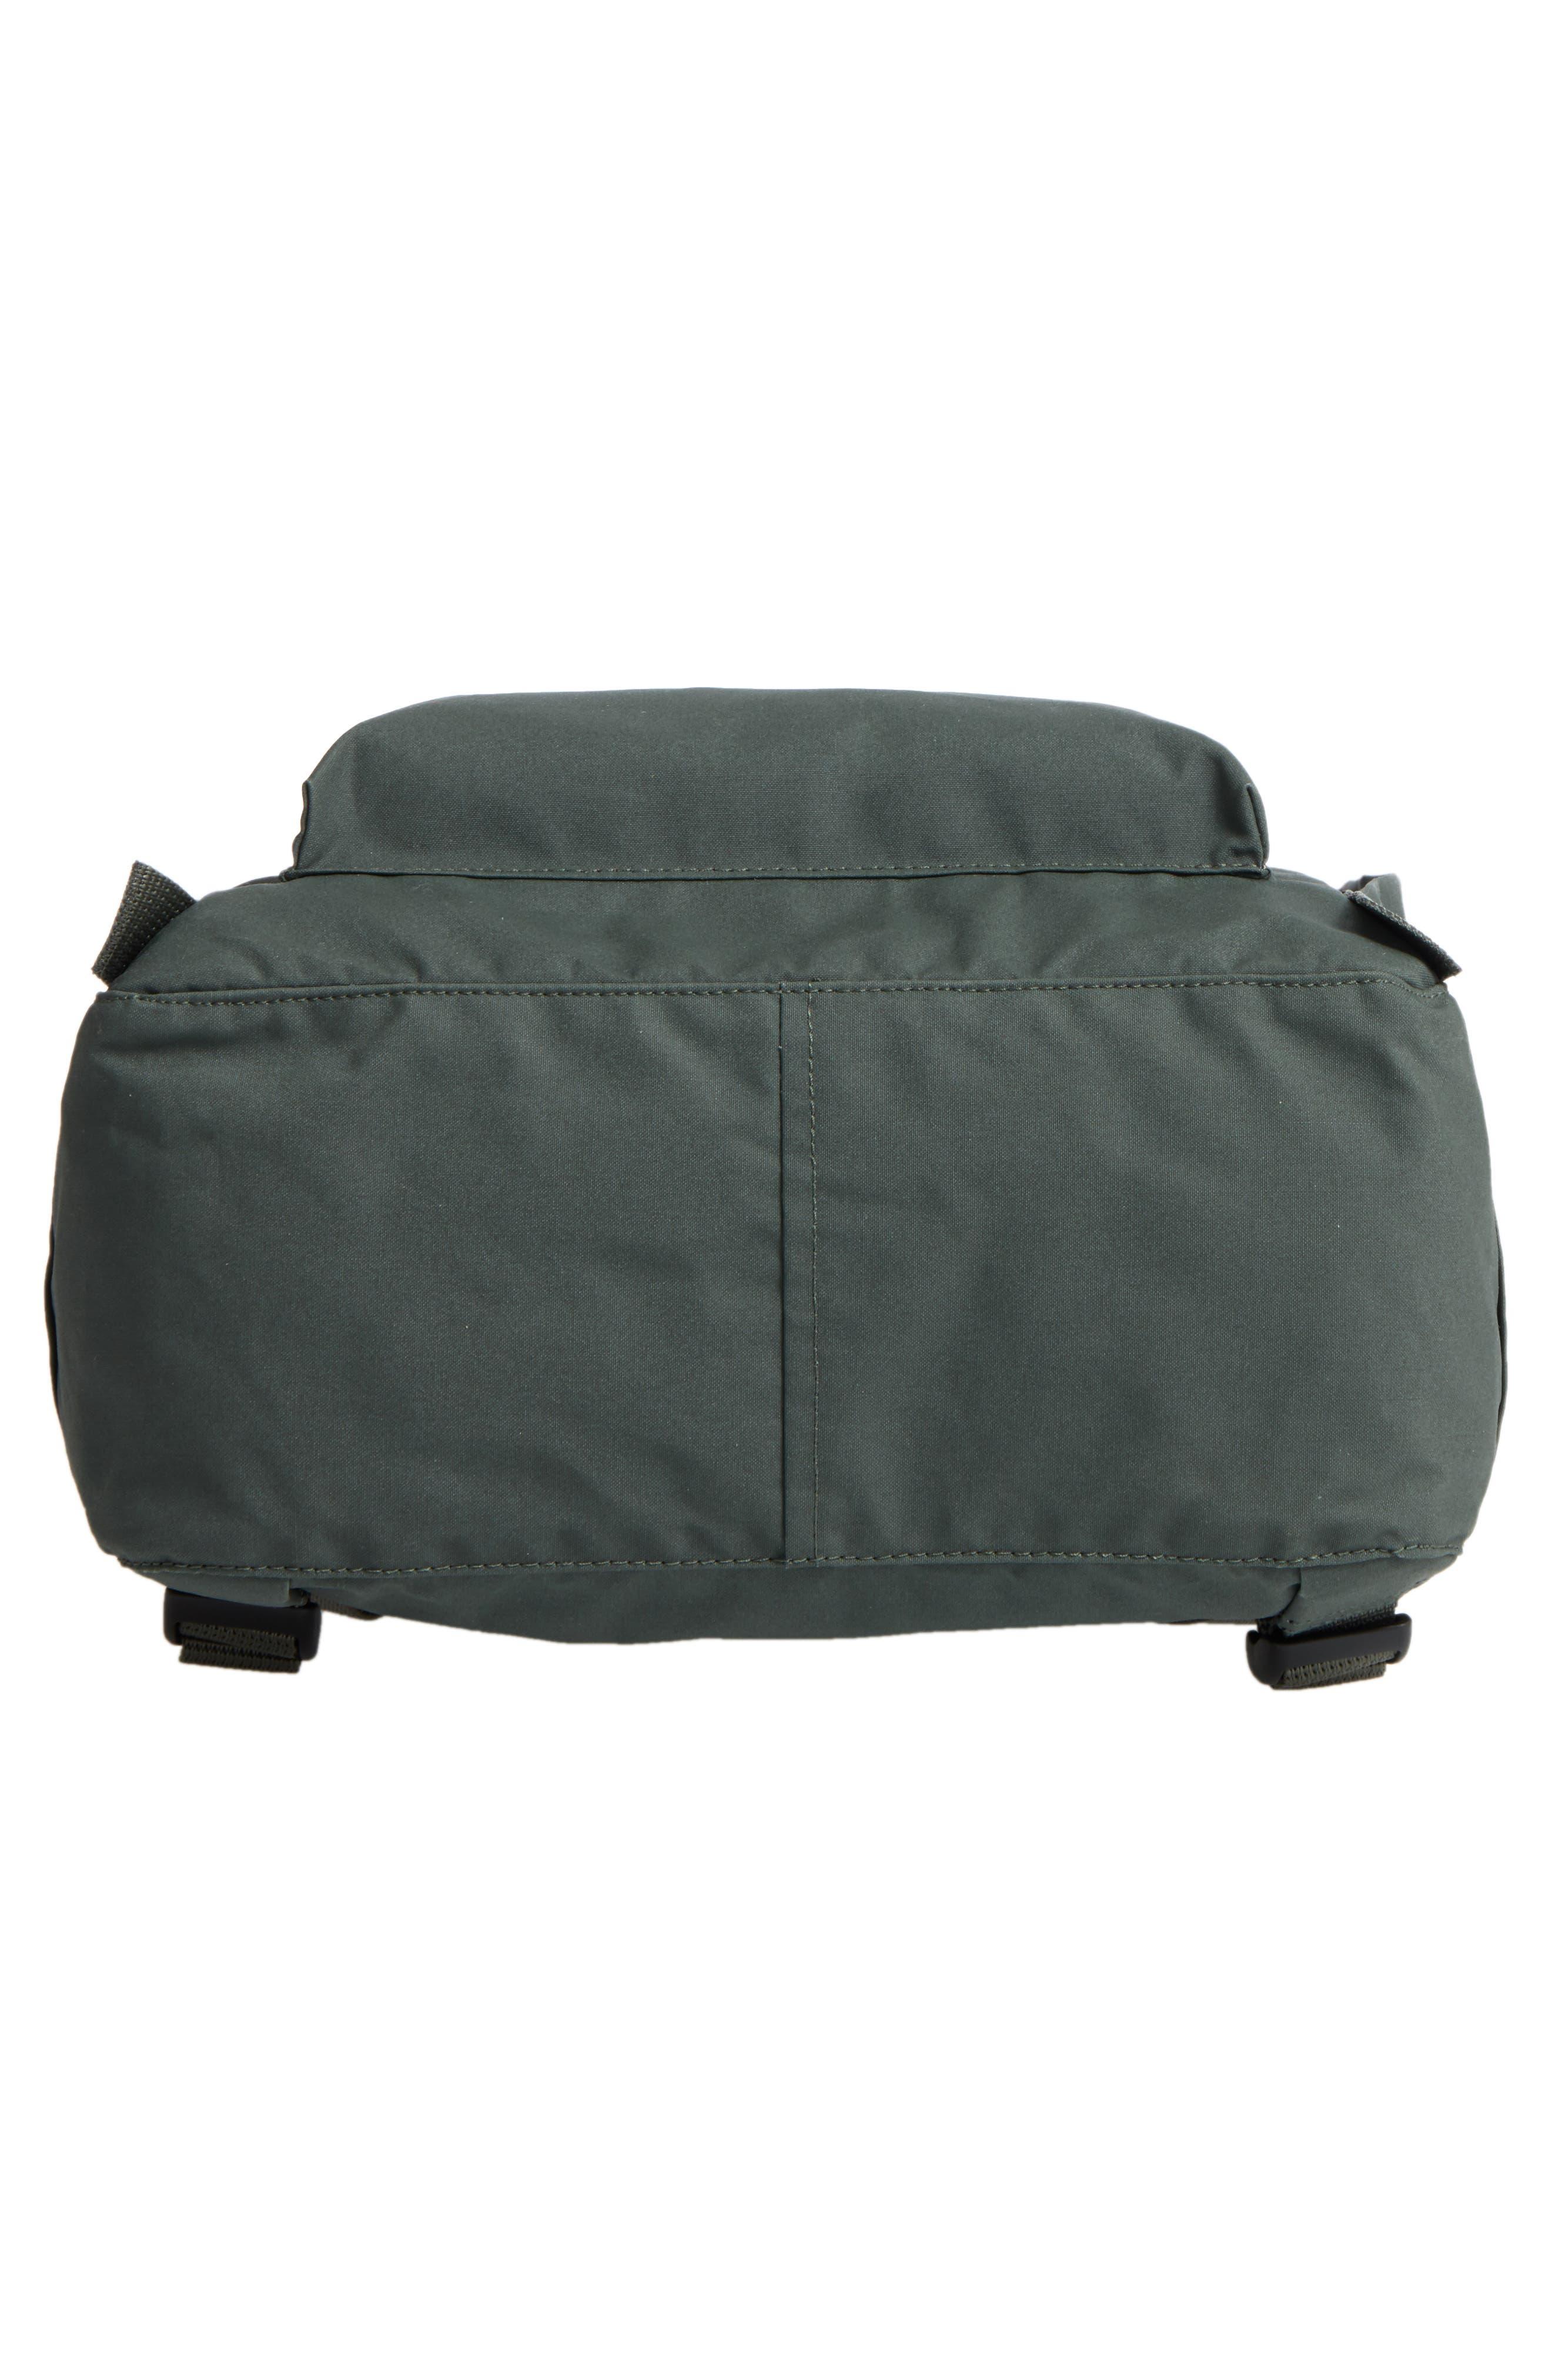 'Kånken' Water Resistant Backpack,                             Alternate thumbnail 349, color,